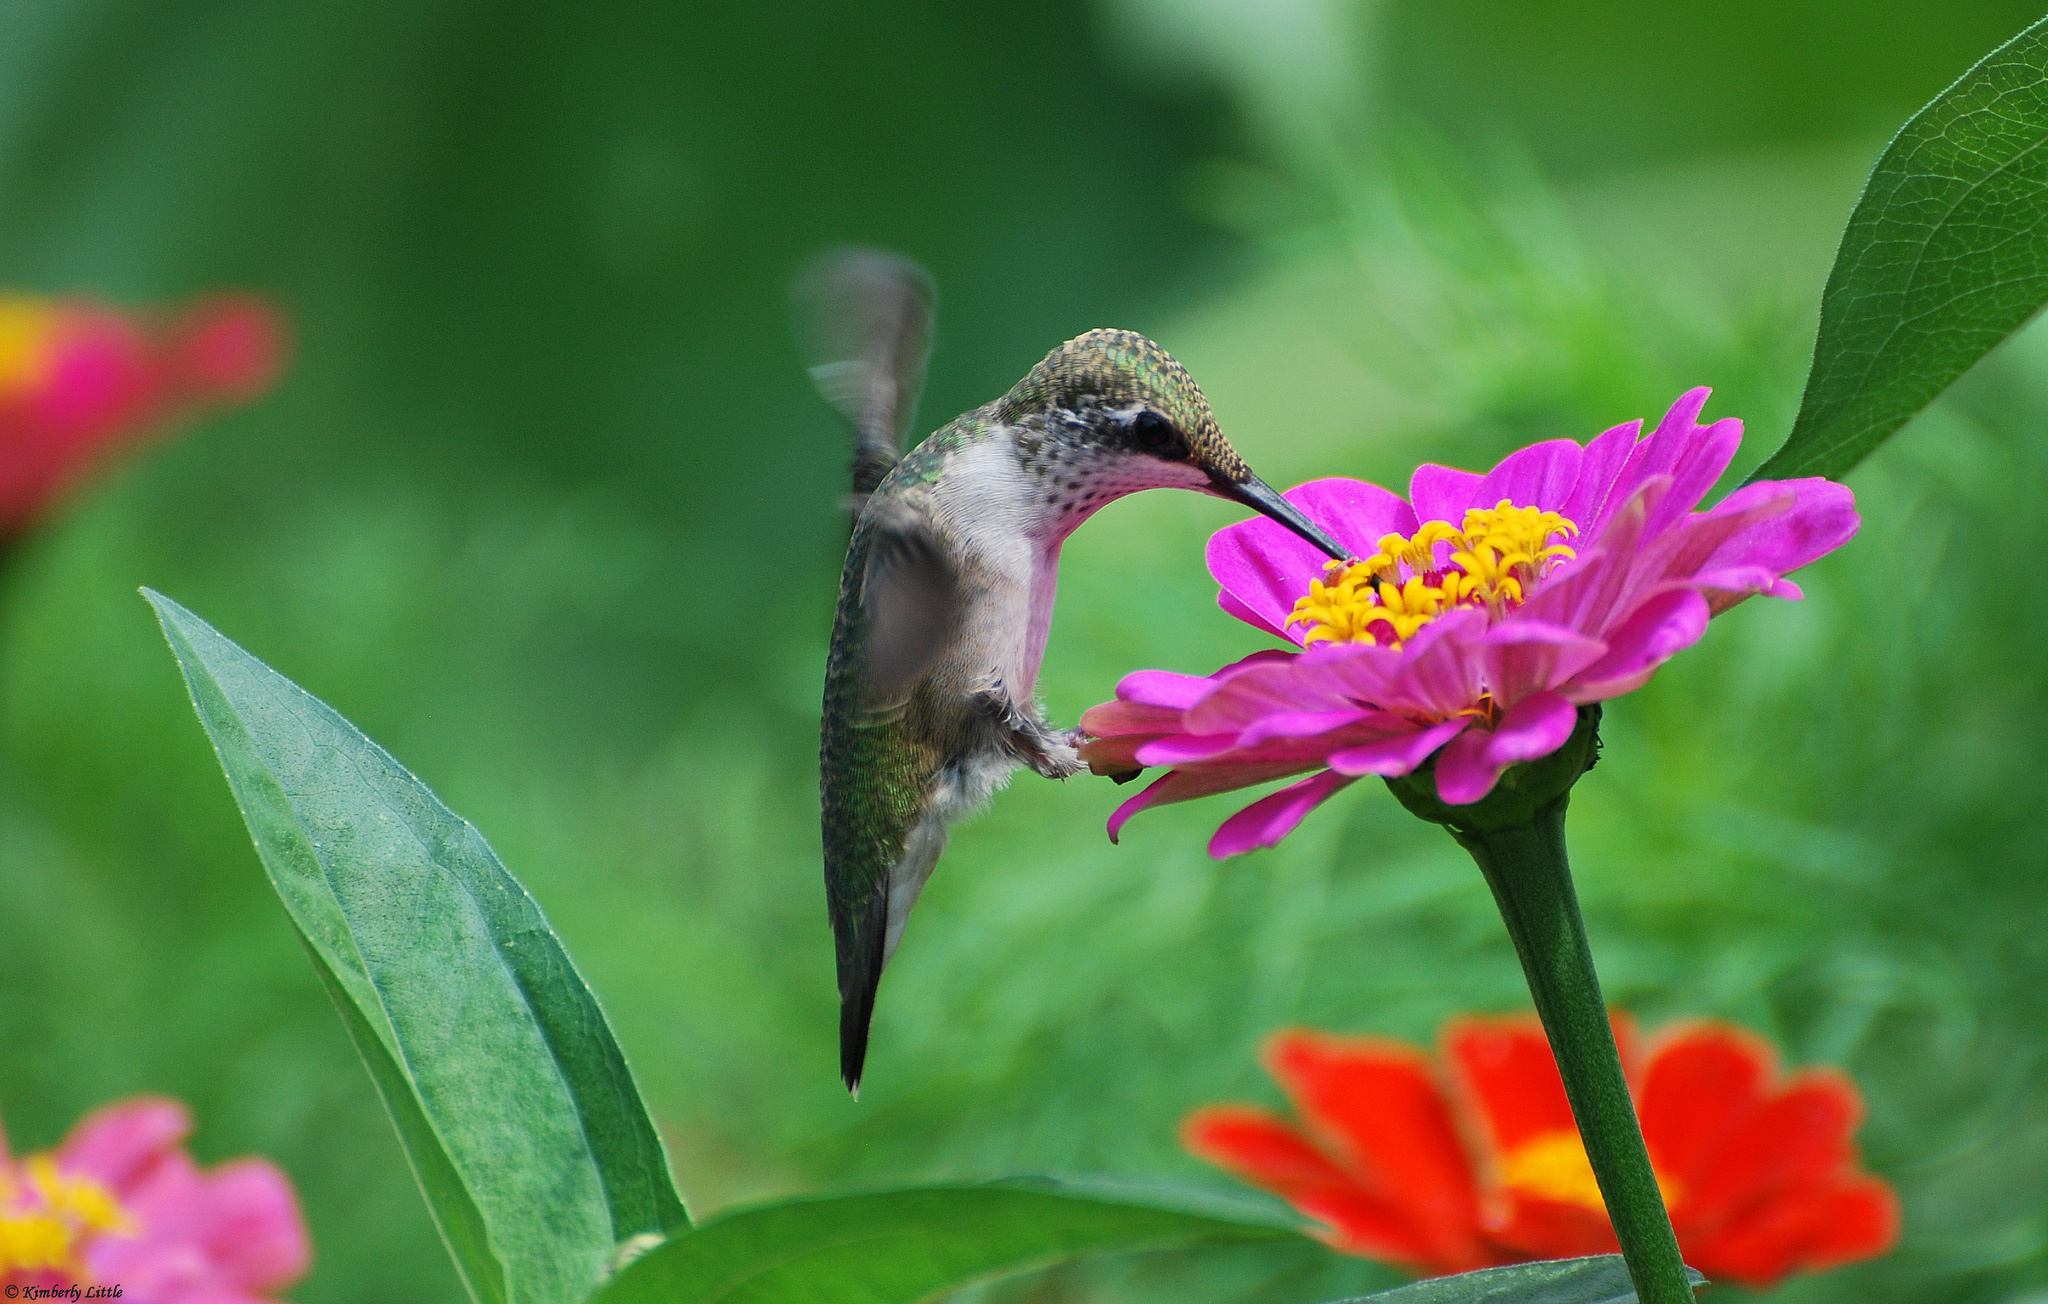 Flowers birds hummingbirds tsiniya pink wallpaper 2048x1304 169566 2048x1304